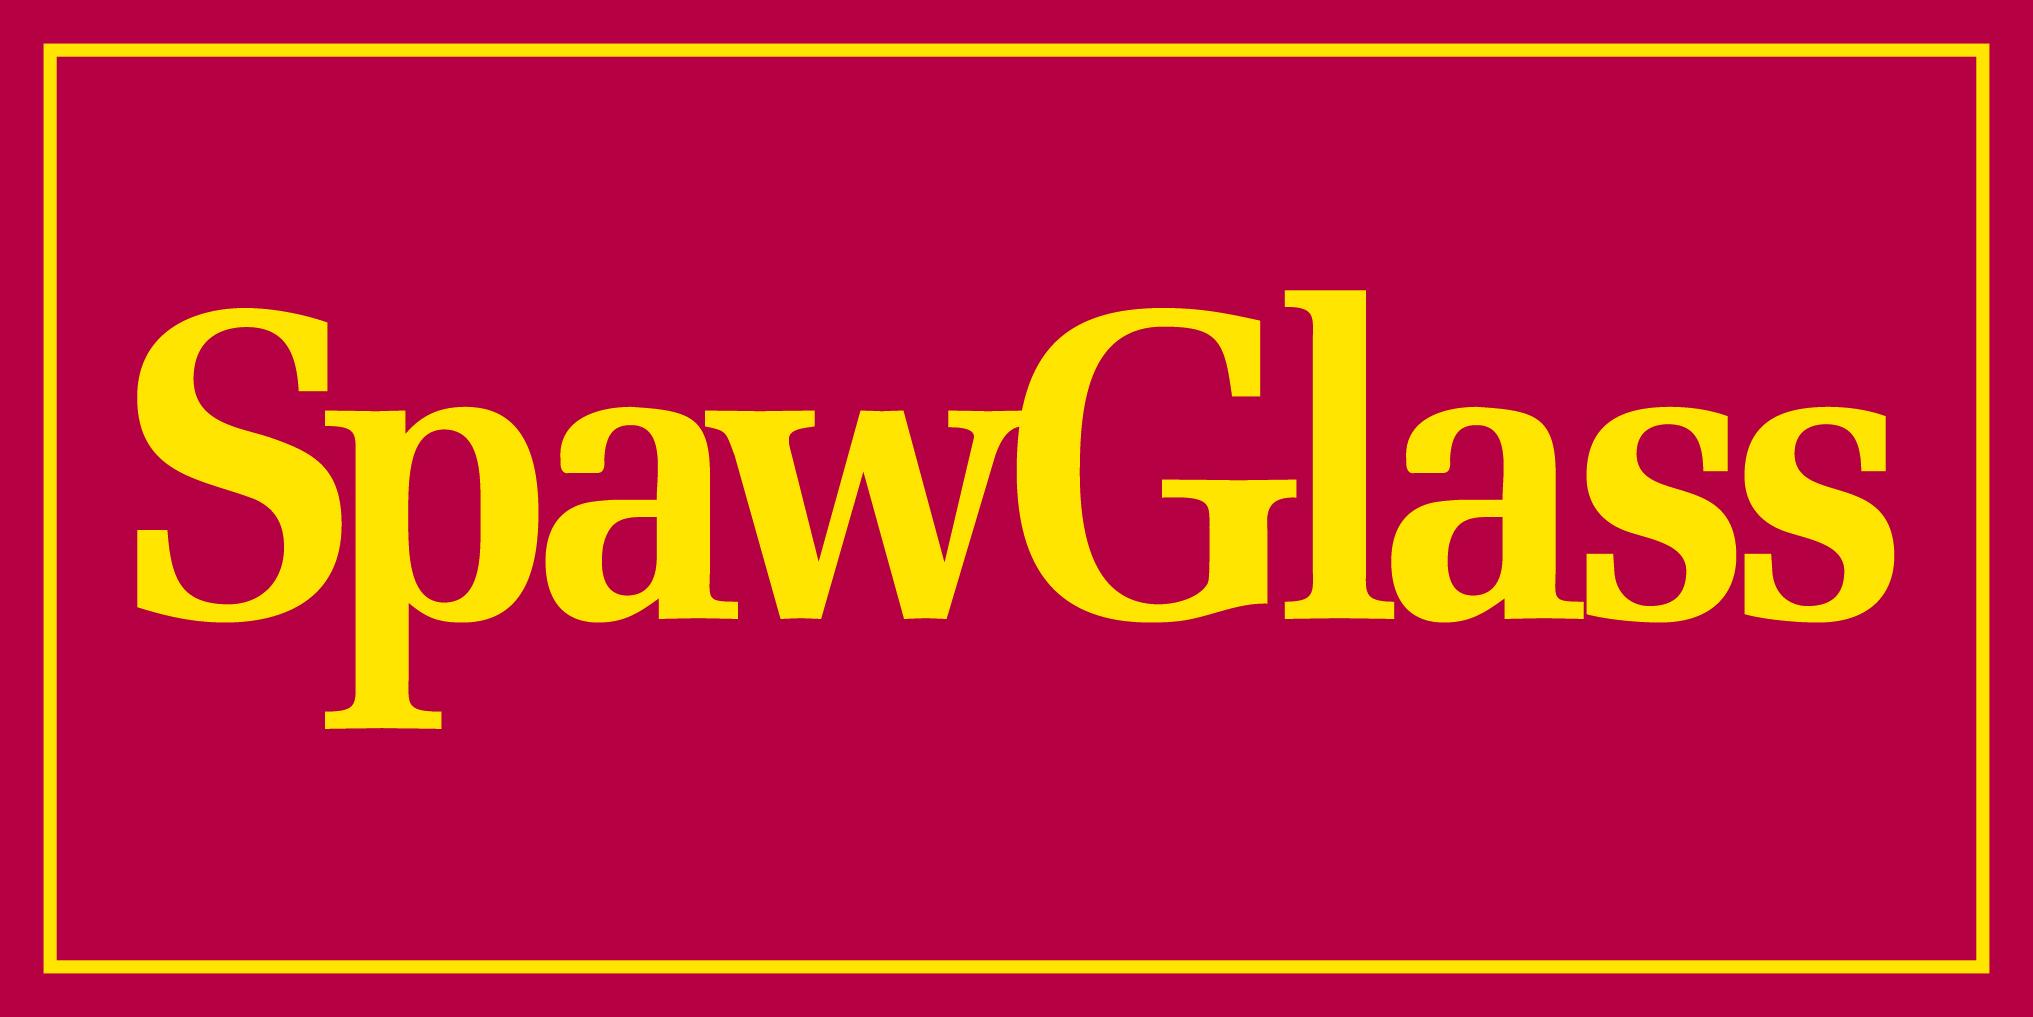 SpawGlass